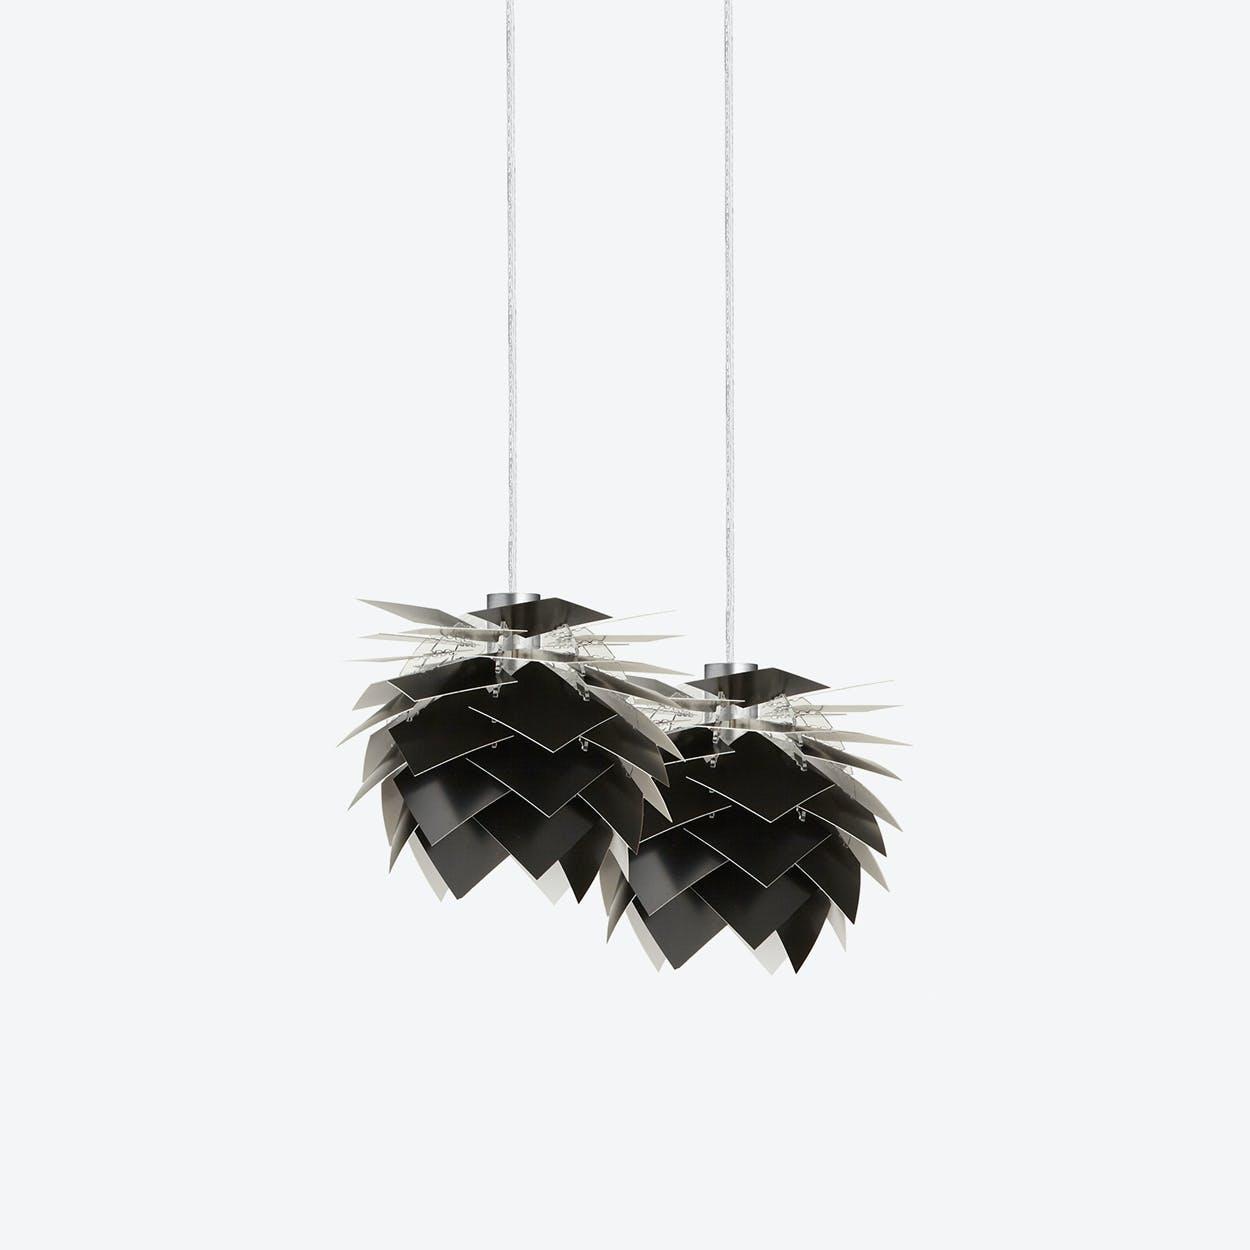 XS PineApple Set of Pendants in Black